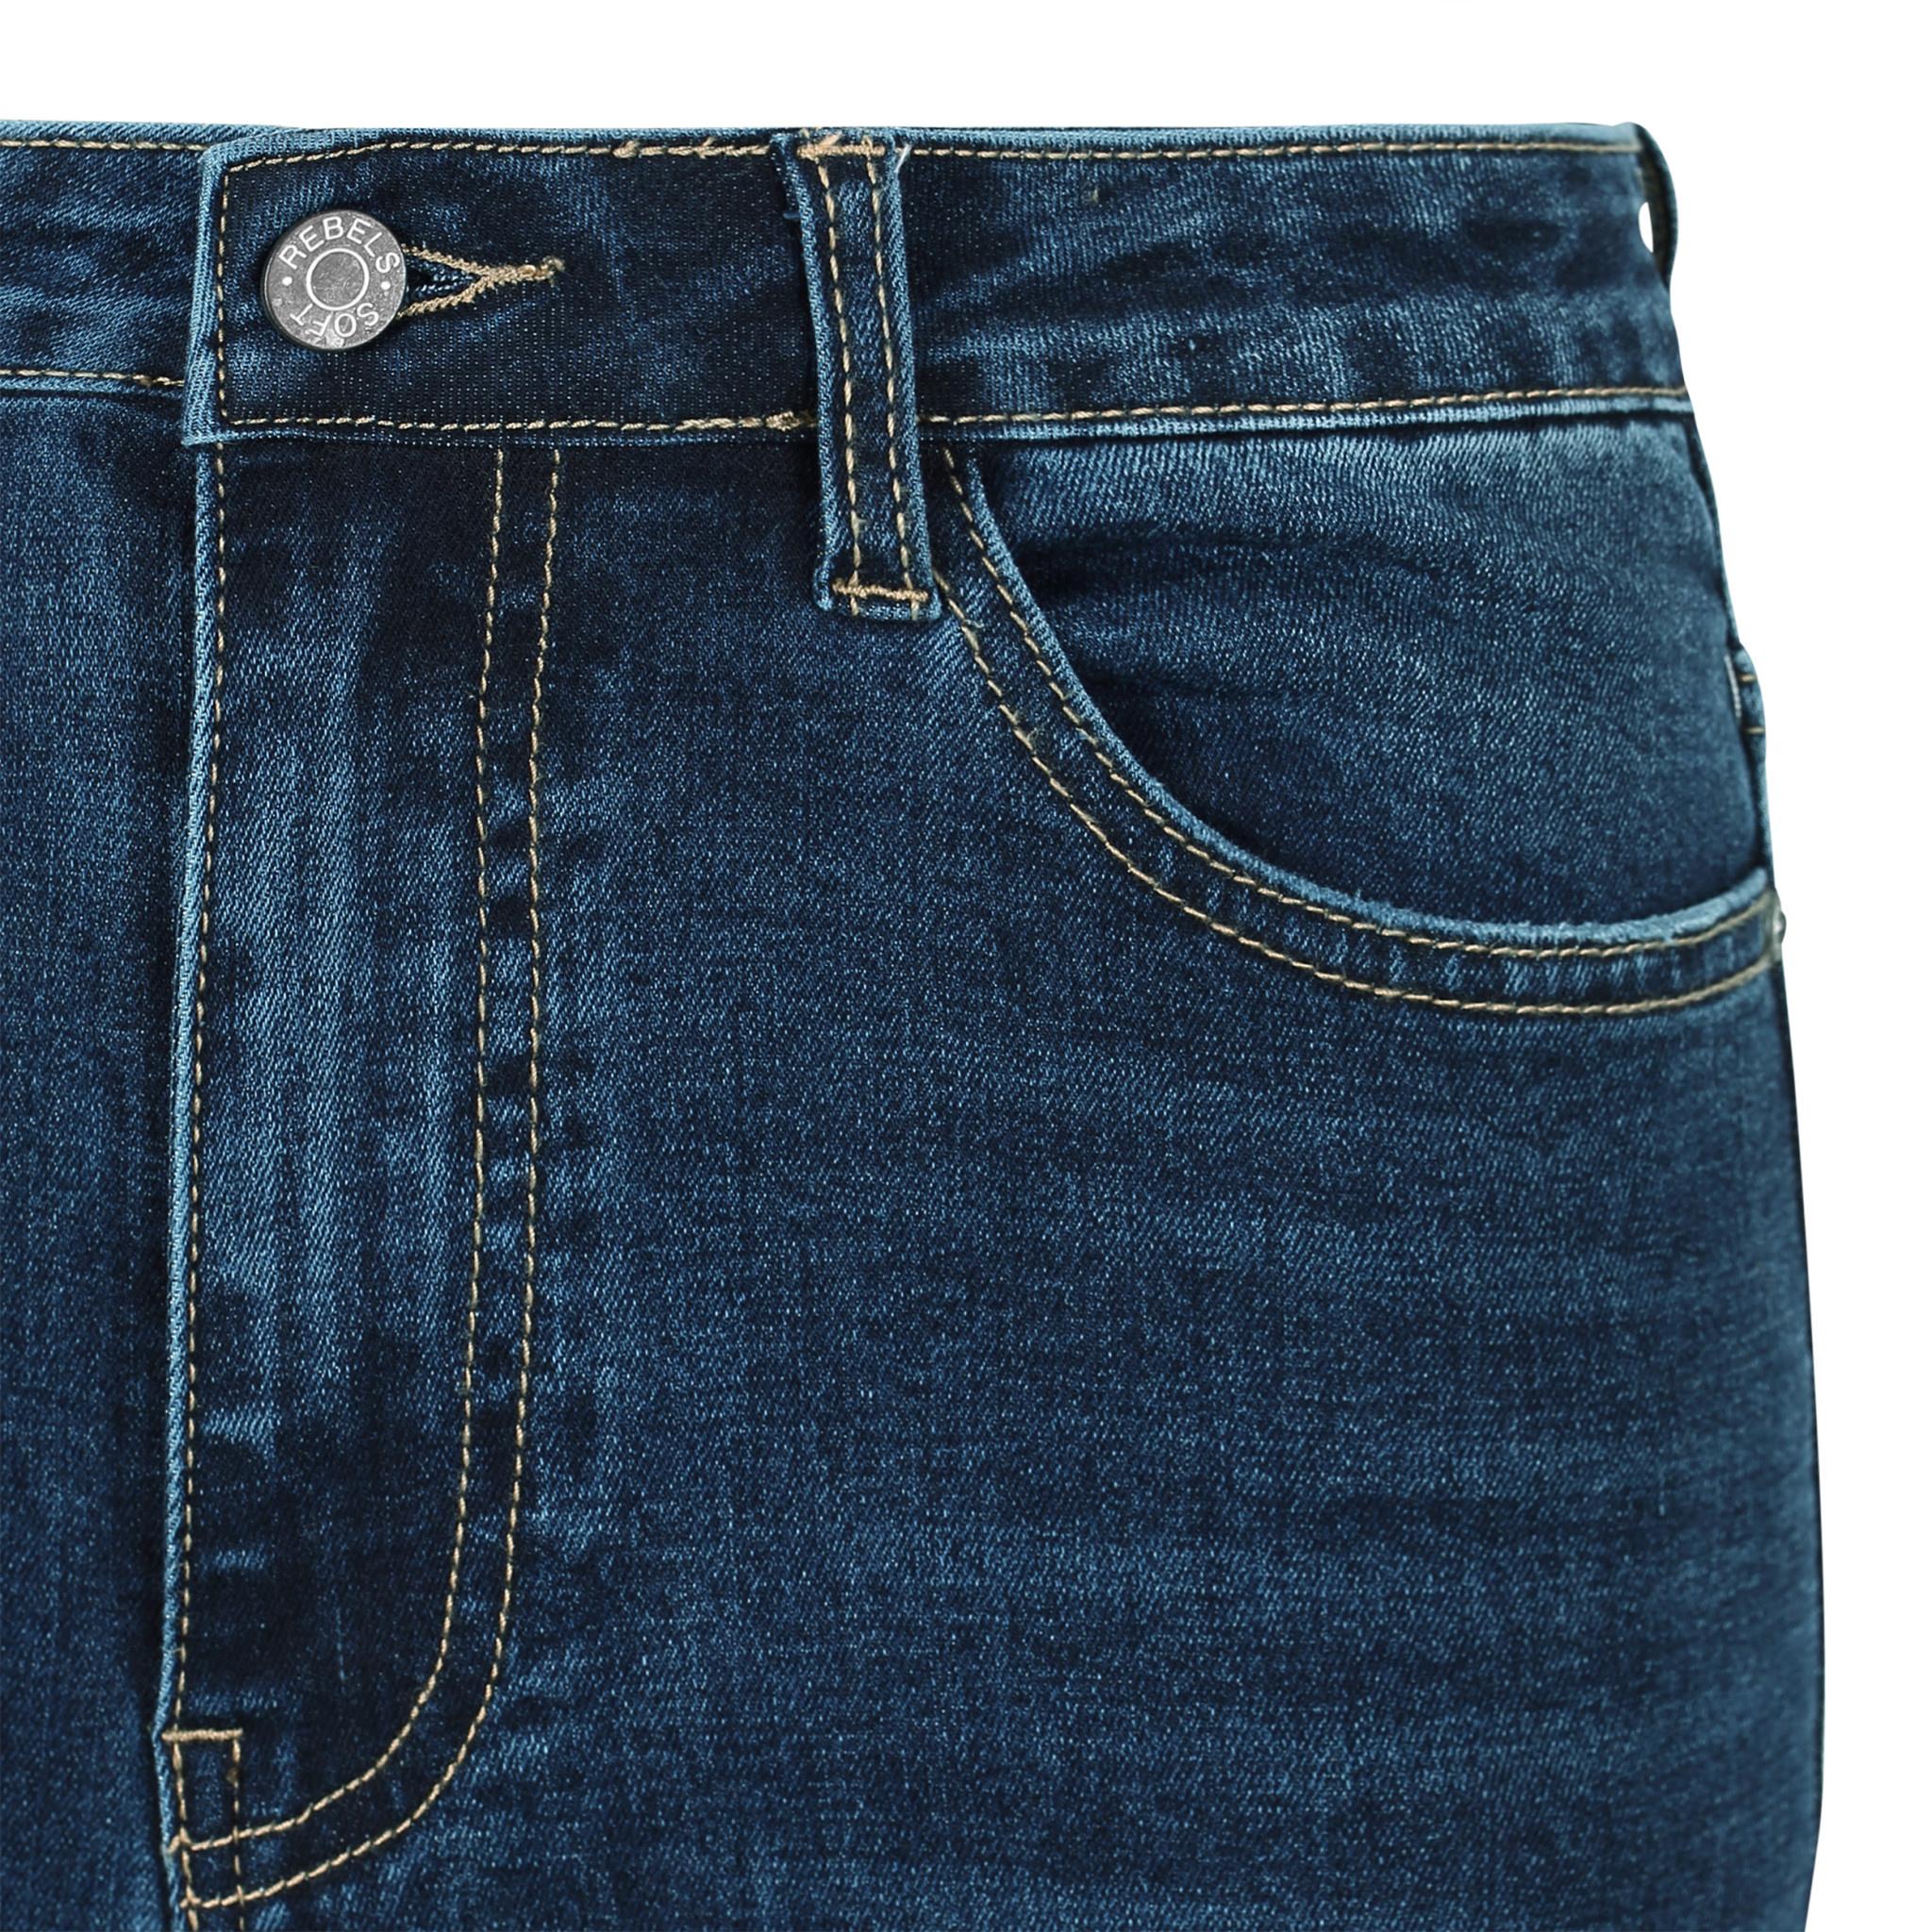 Soft Rebels Highwaist slim jeans - Donkerblauw